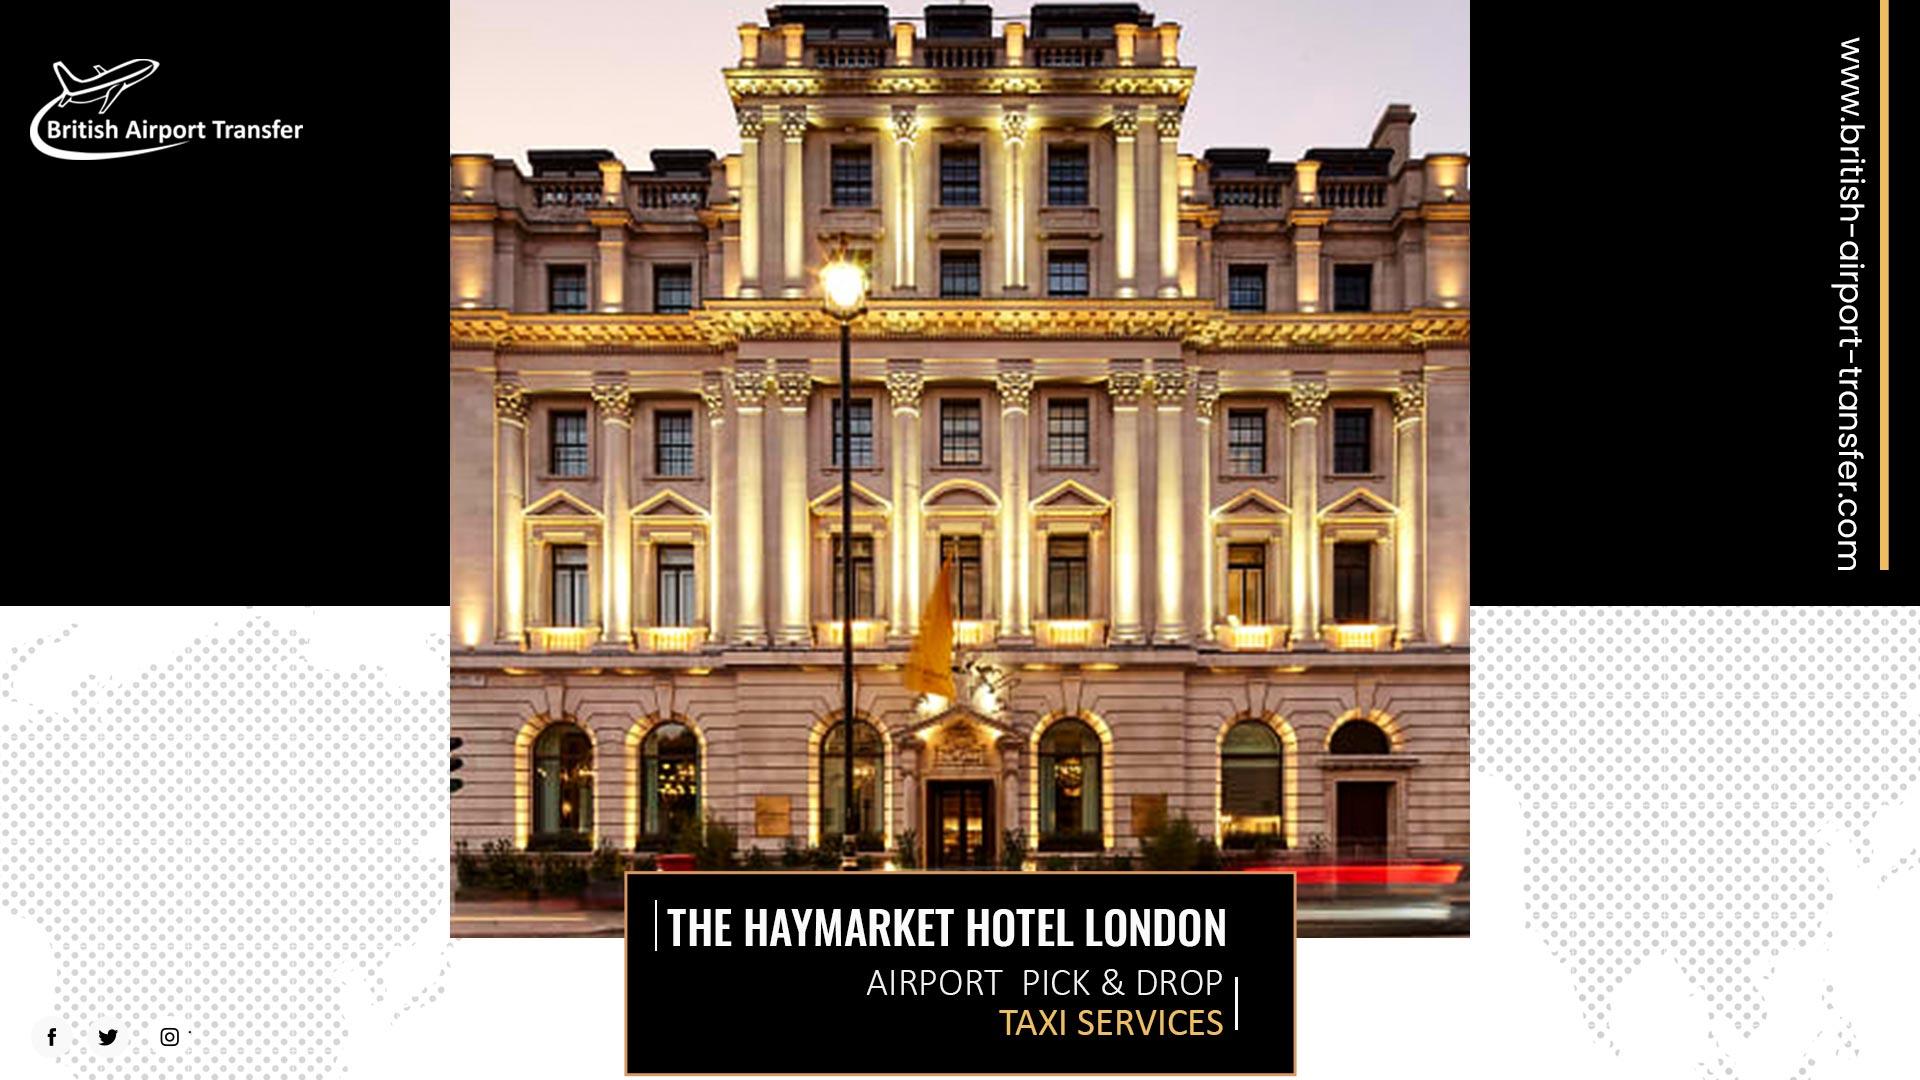 Taxi Cab – The Haymarket Hotel London / SW1Y 4HX